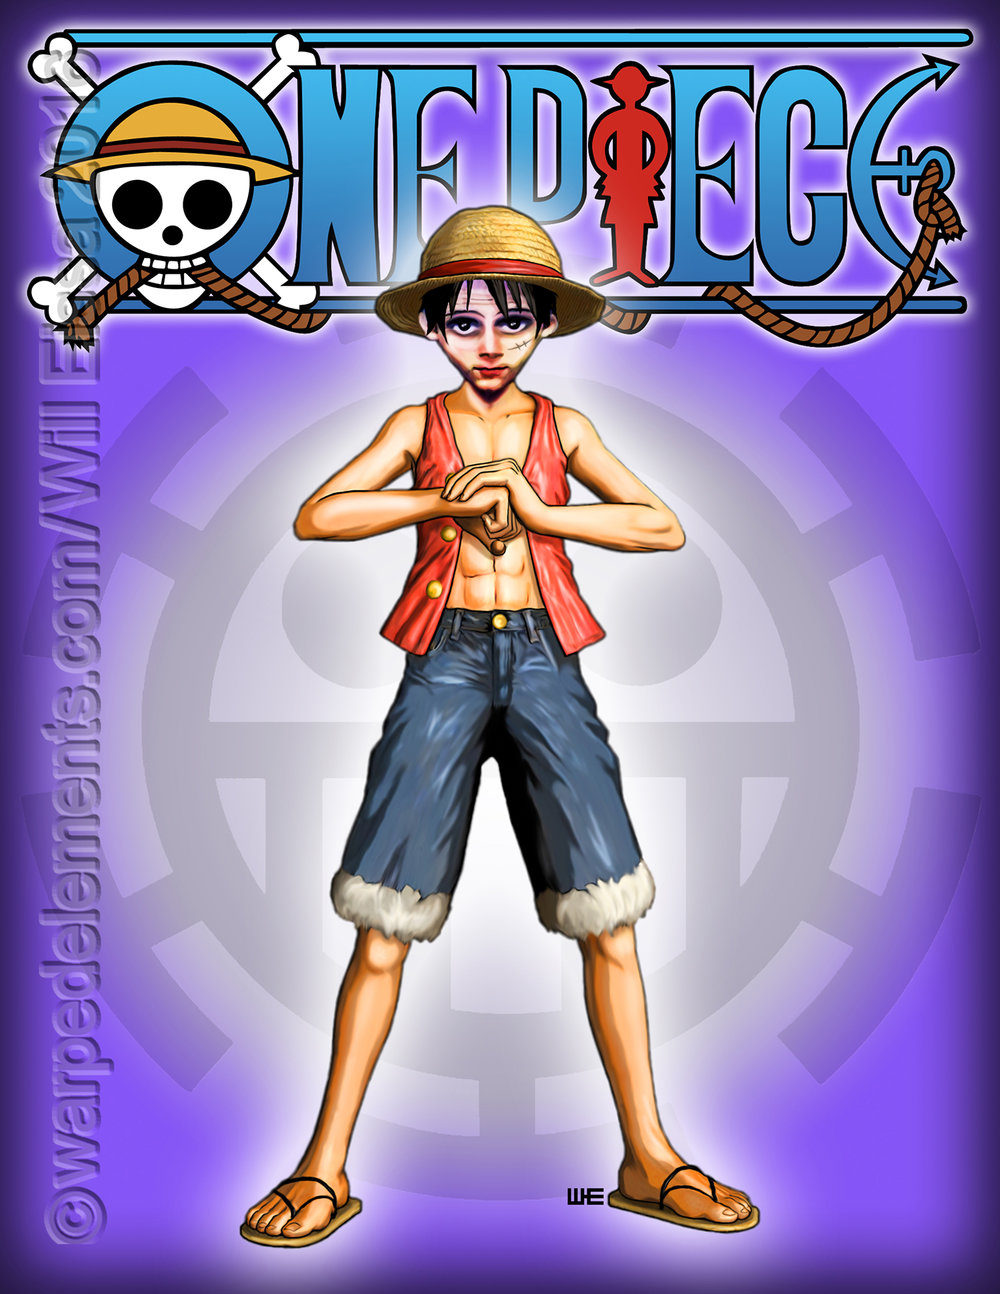 A-One Piece.jpg